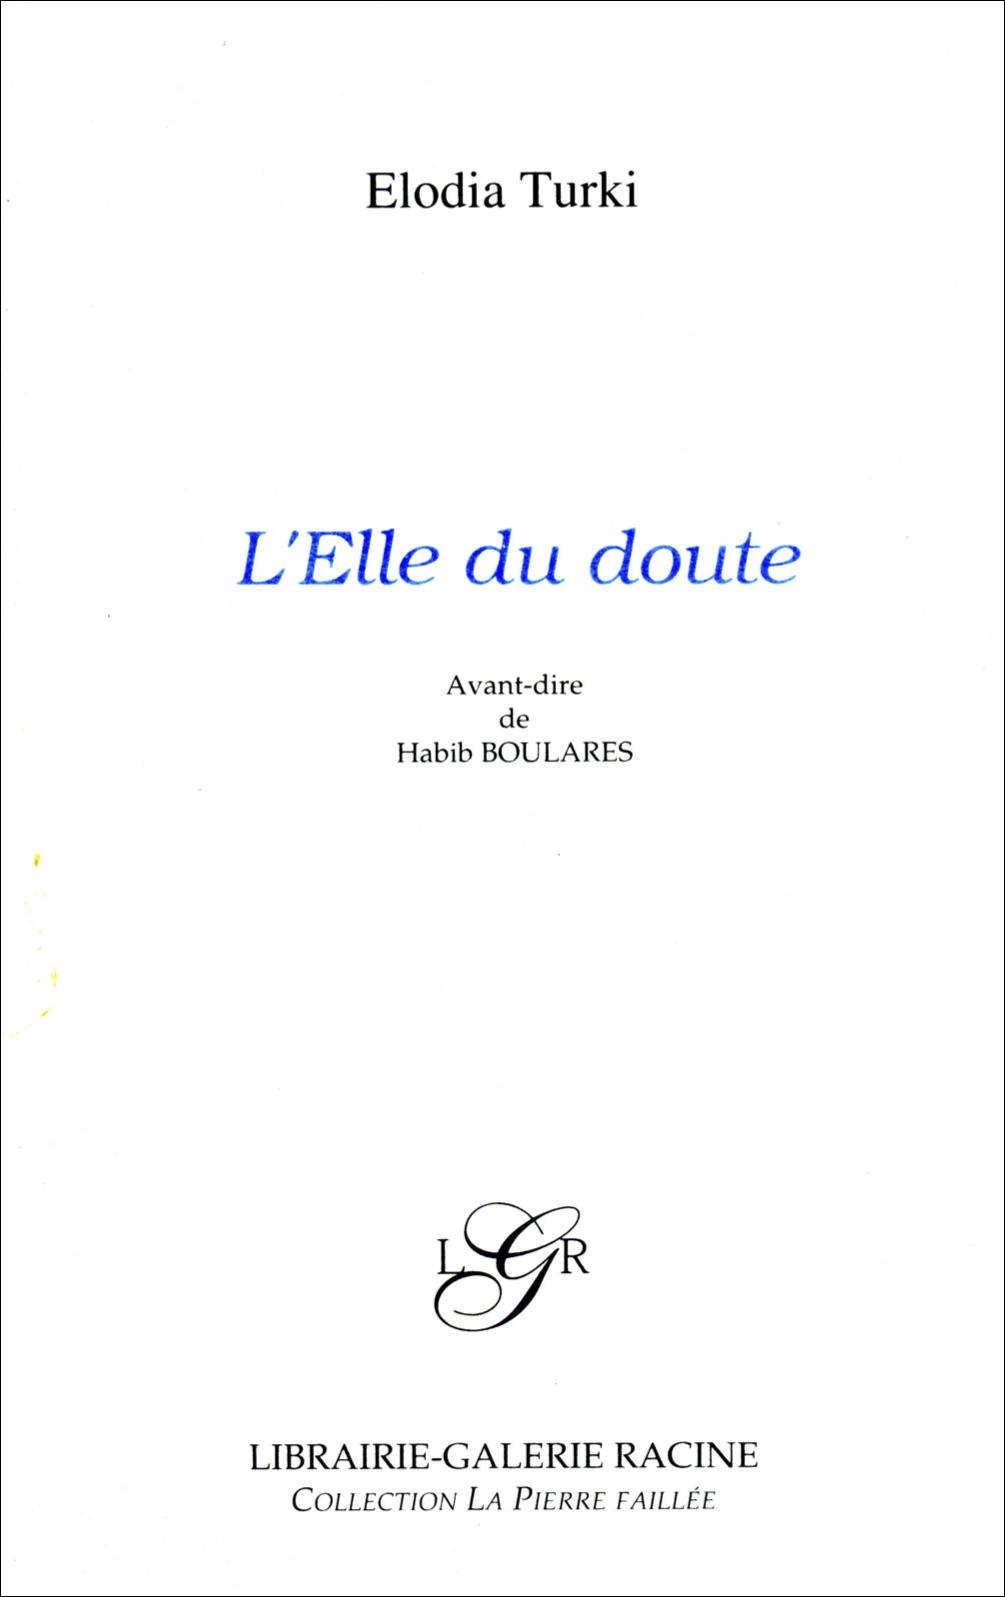 Elodia TURKI - L'Elle du doute